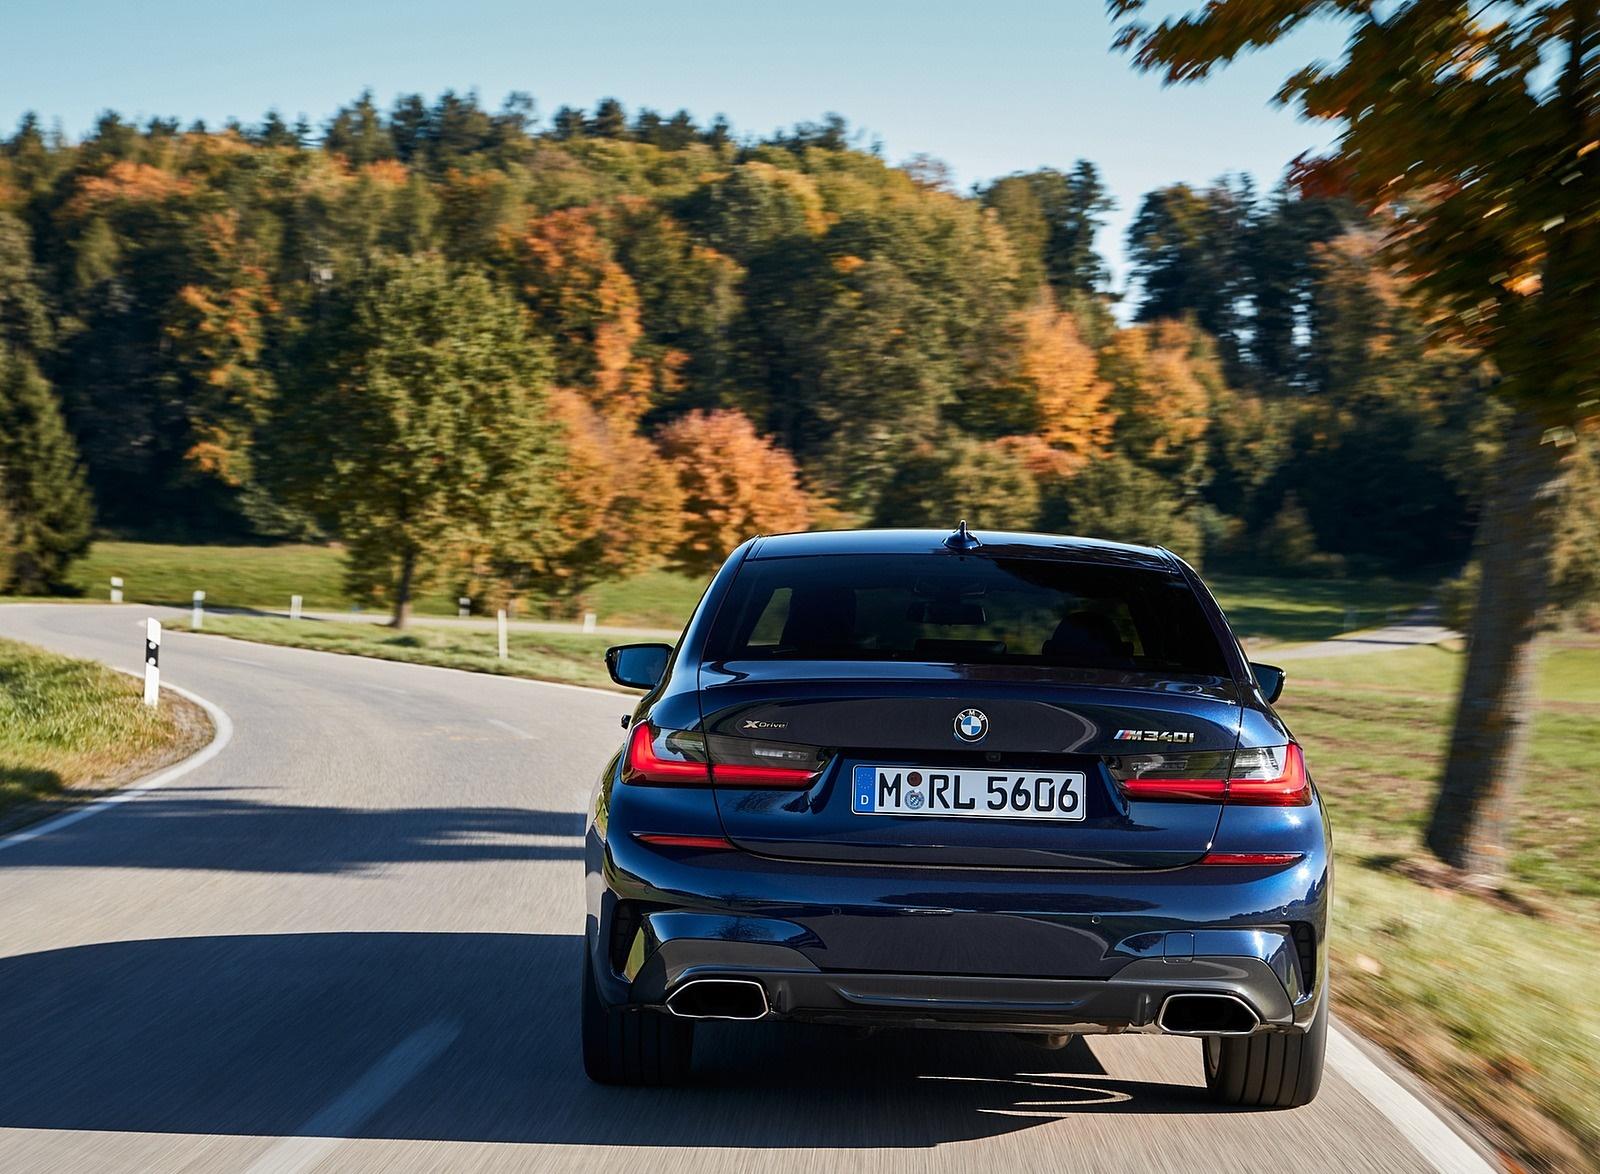 2020 BMW M340i Sedan (Color: Tanzanite Blue Metallic) Rear Wallpapers #22 of 74